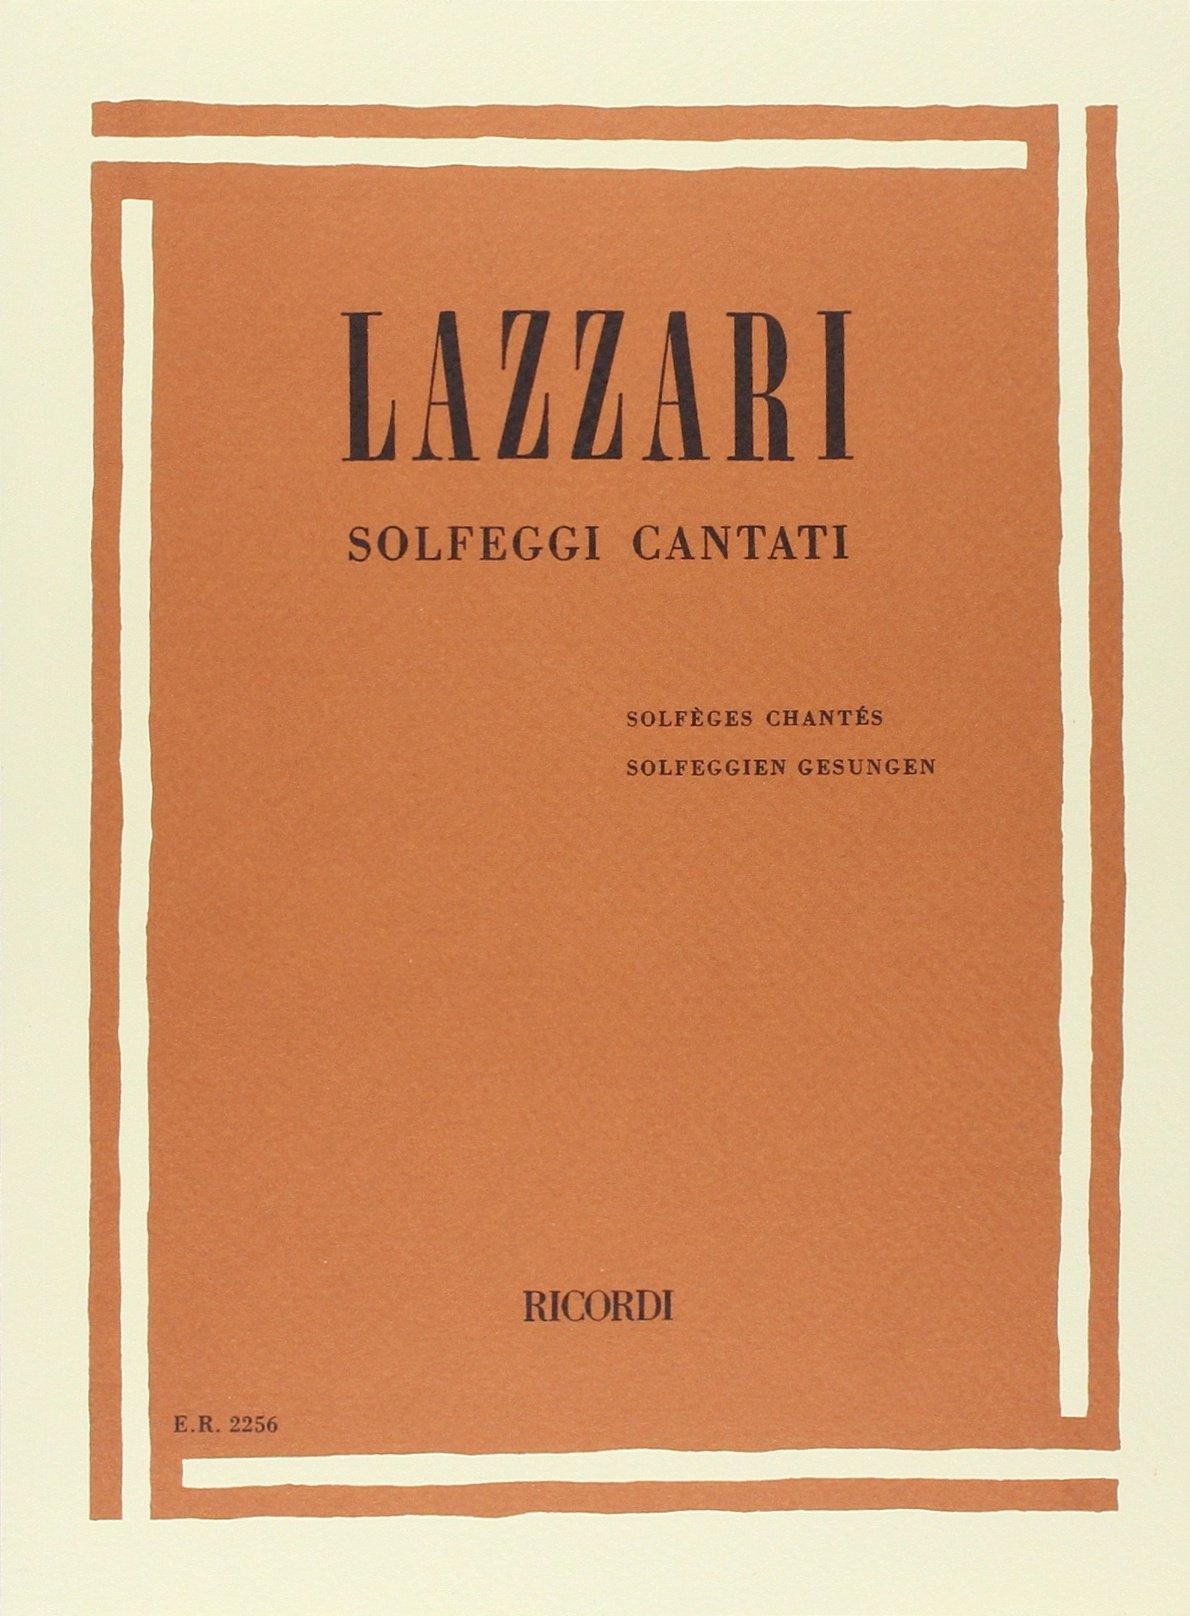 SOLFEGGI CANTATI (Francese) Copertina flessibile – 1 gen 1984 LAZZARI A. Ricordi 0041822560 Musique